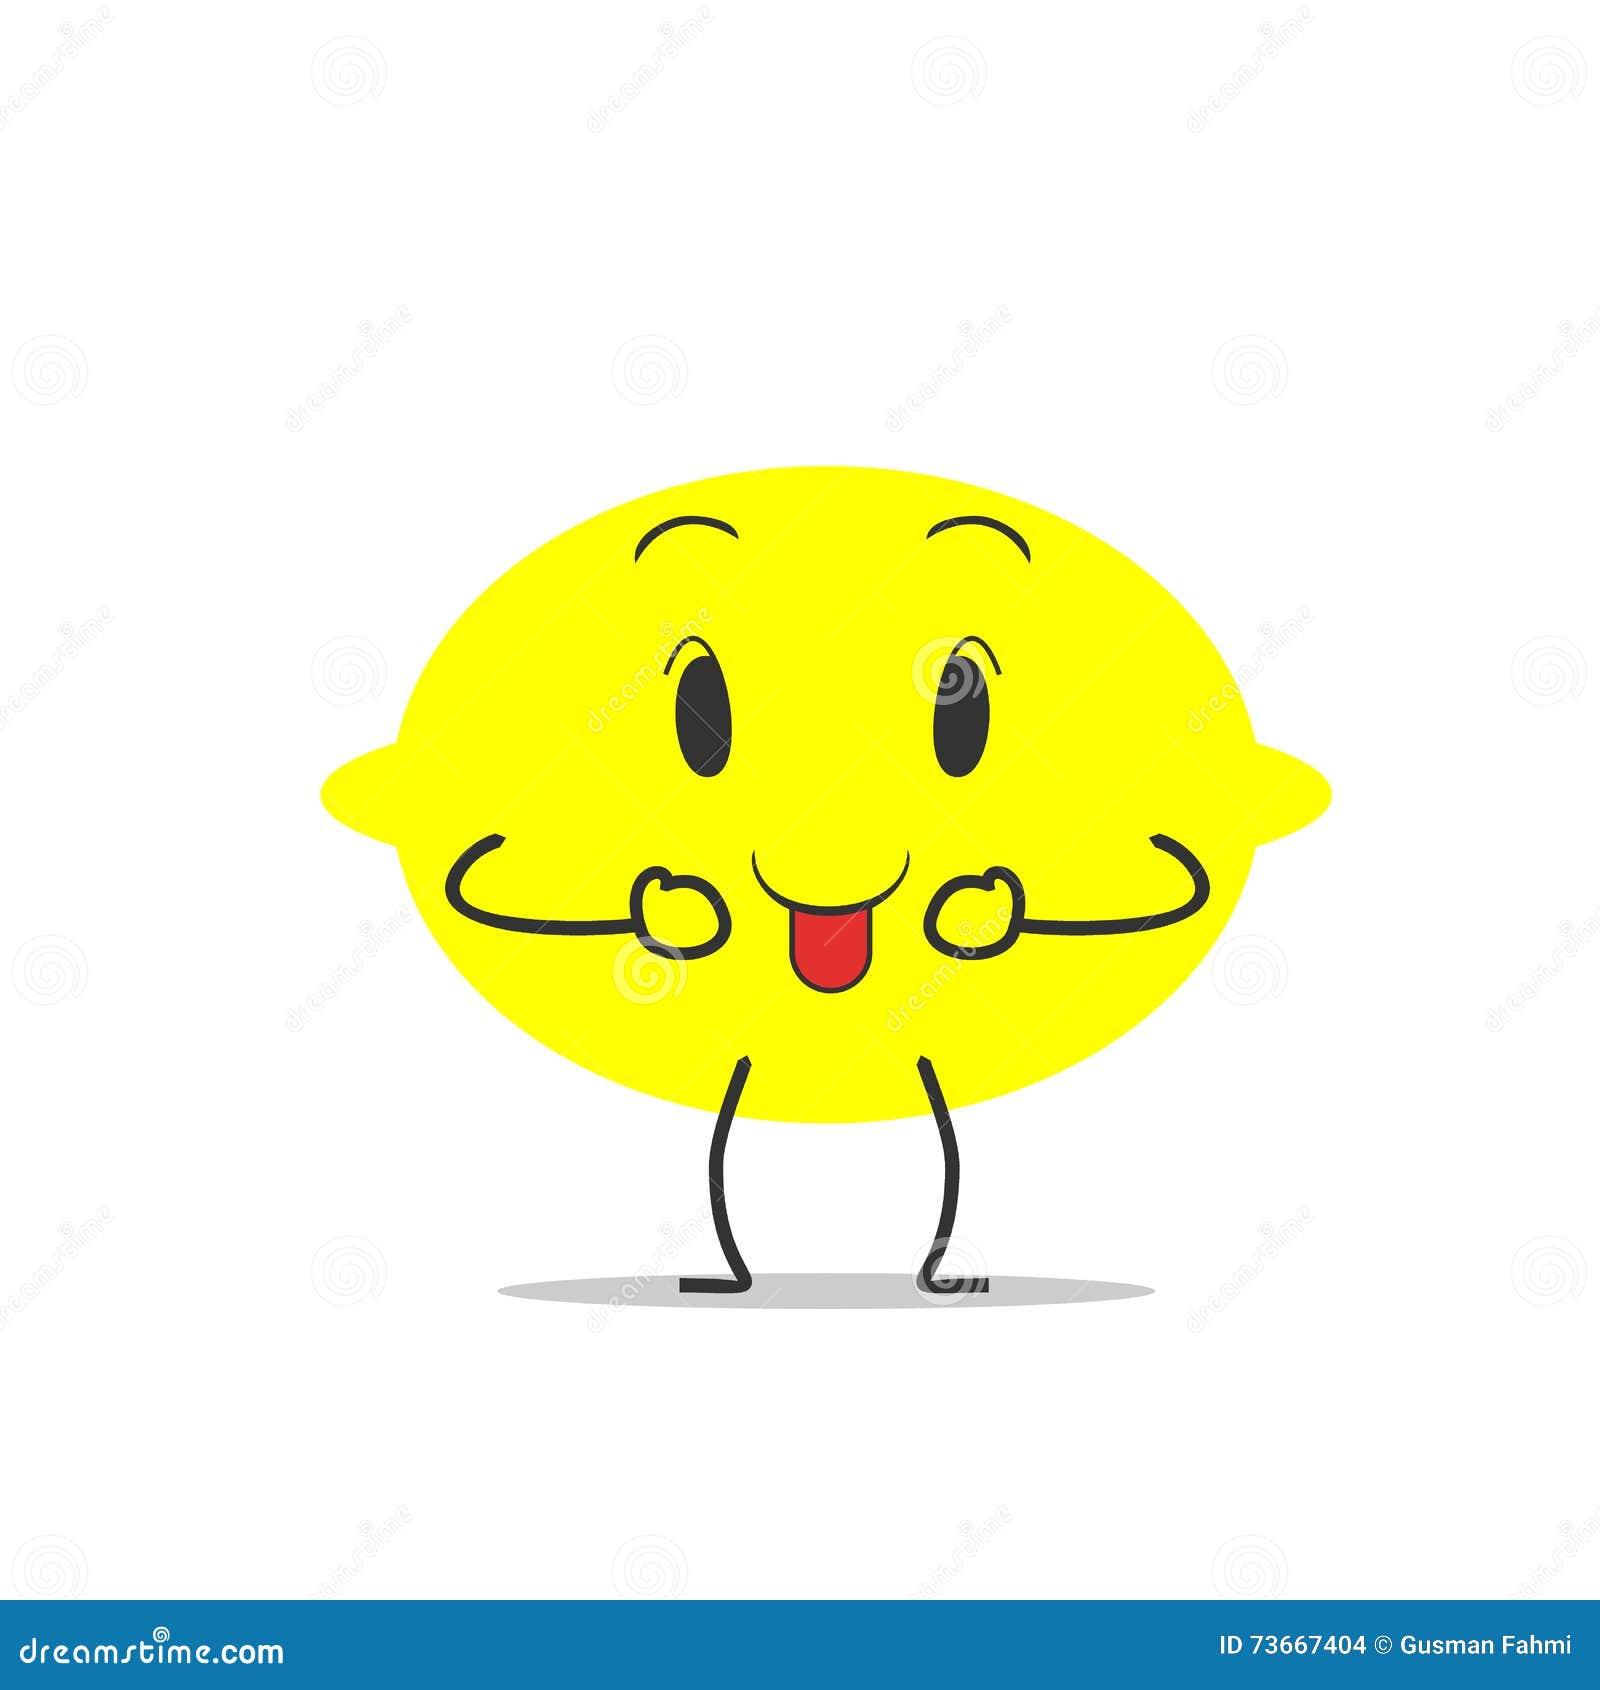 tongue lemon simple clean cartoon illustration stock vector tongue lemon simple clean cartoon illustration